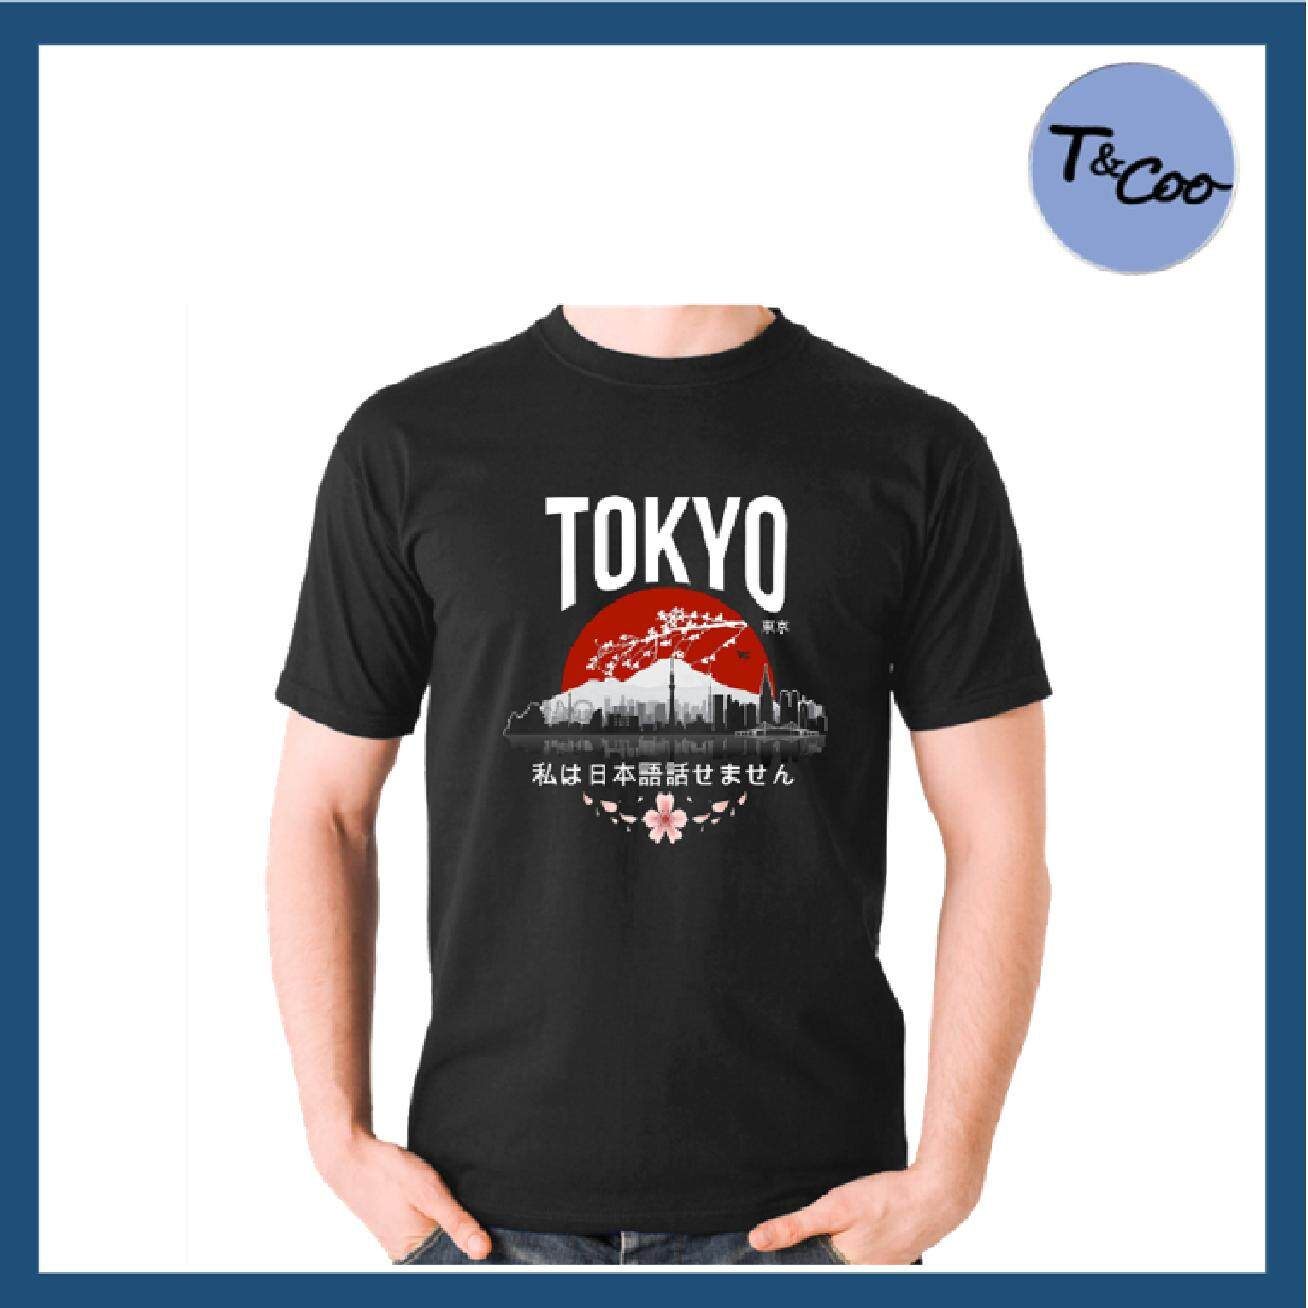 5c34b1f92 T shirt for men Tokyo sakura 100% Cotton T shirt Man Casual Look